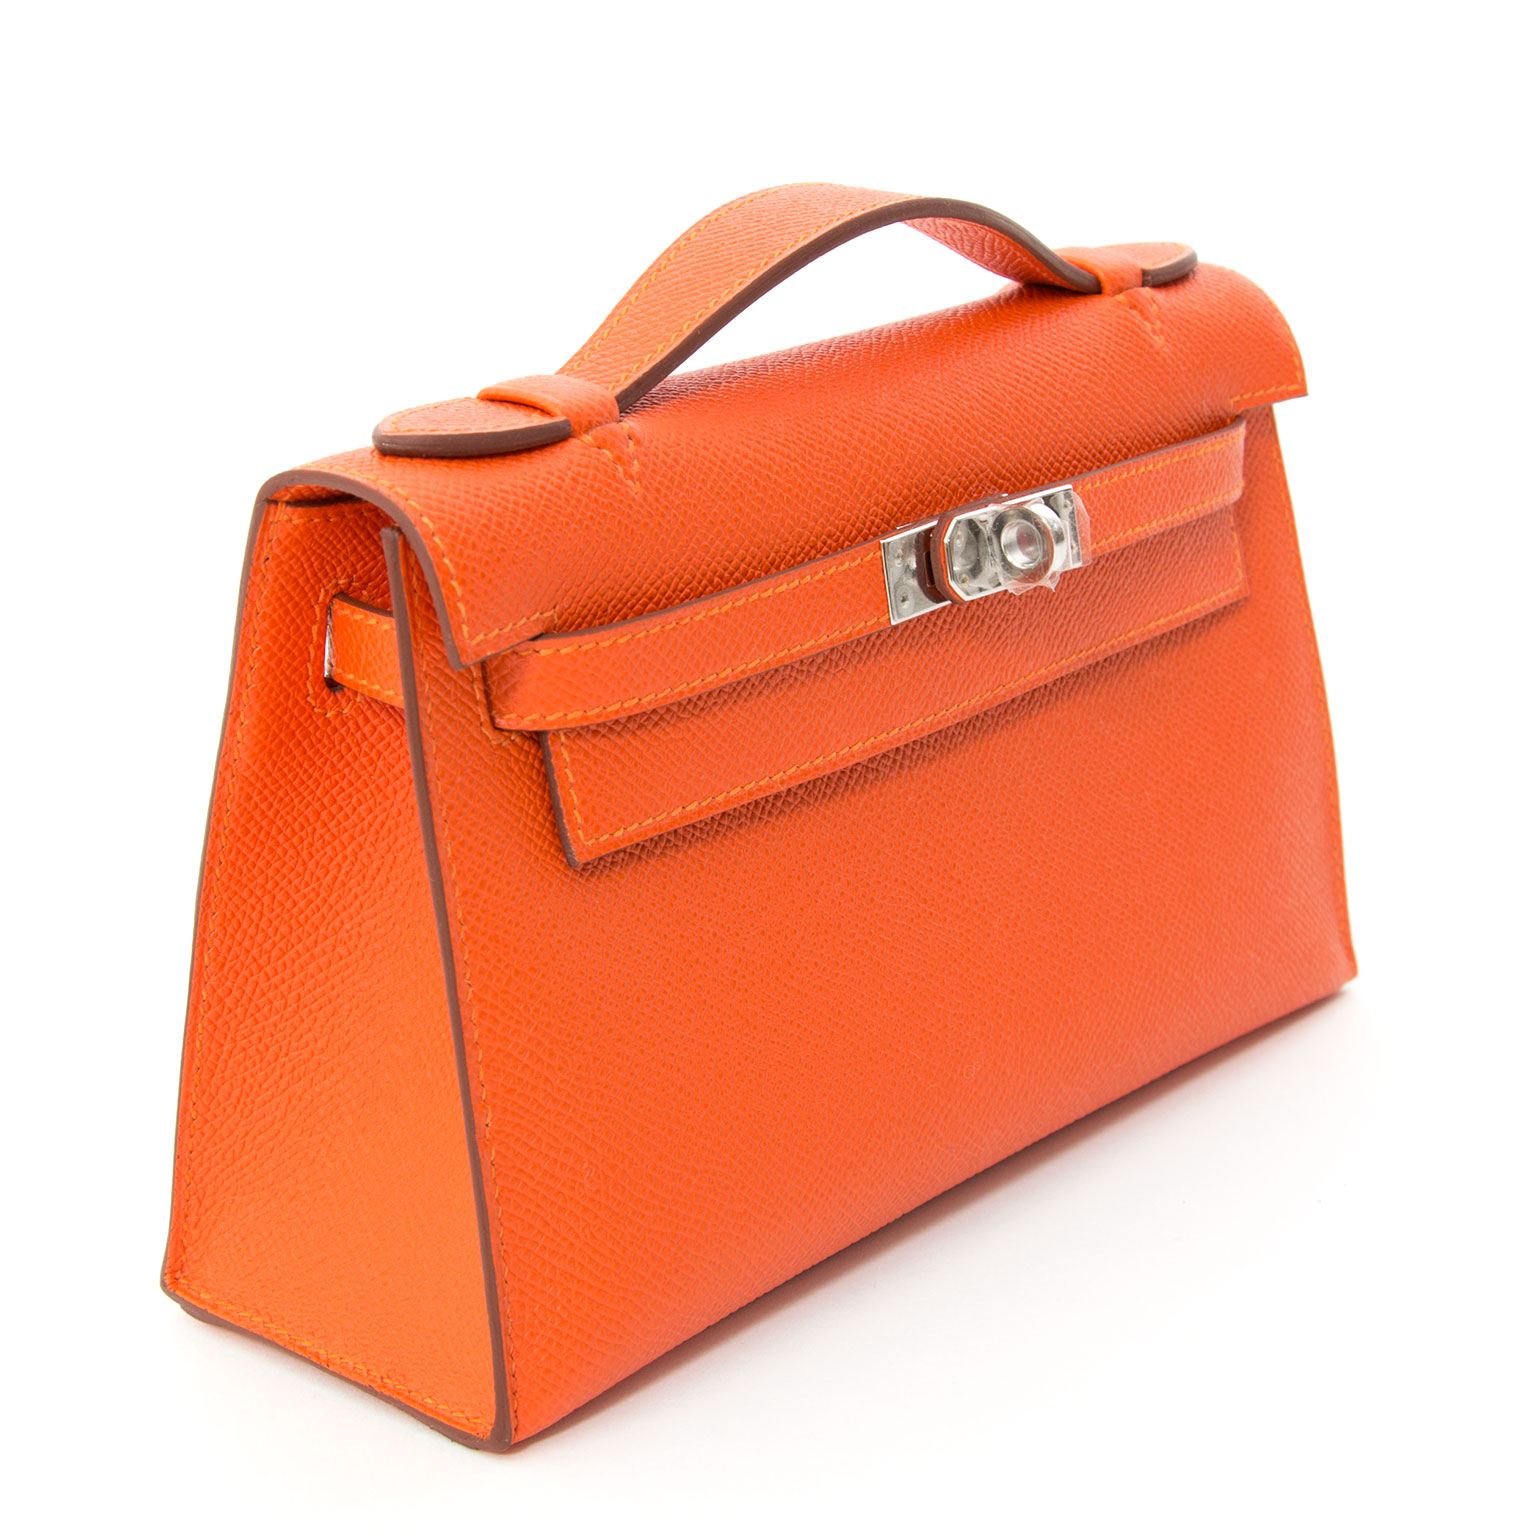 birkin bag hermes price - hermes new craie veau swift mini kelly pochette - ghw - 2016, what ...